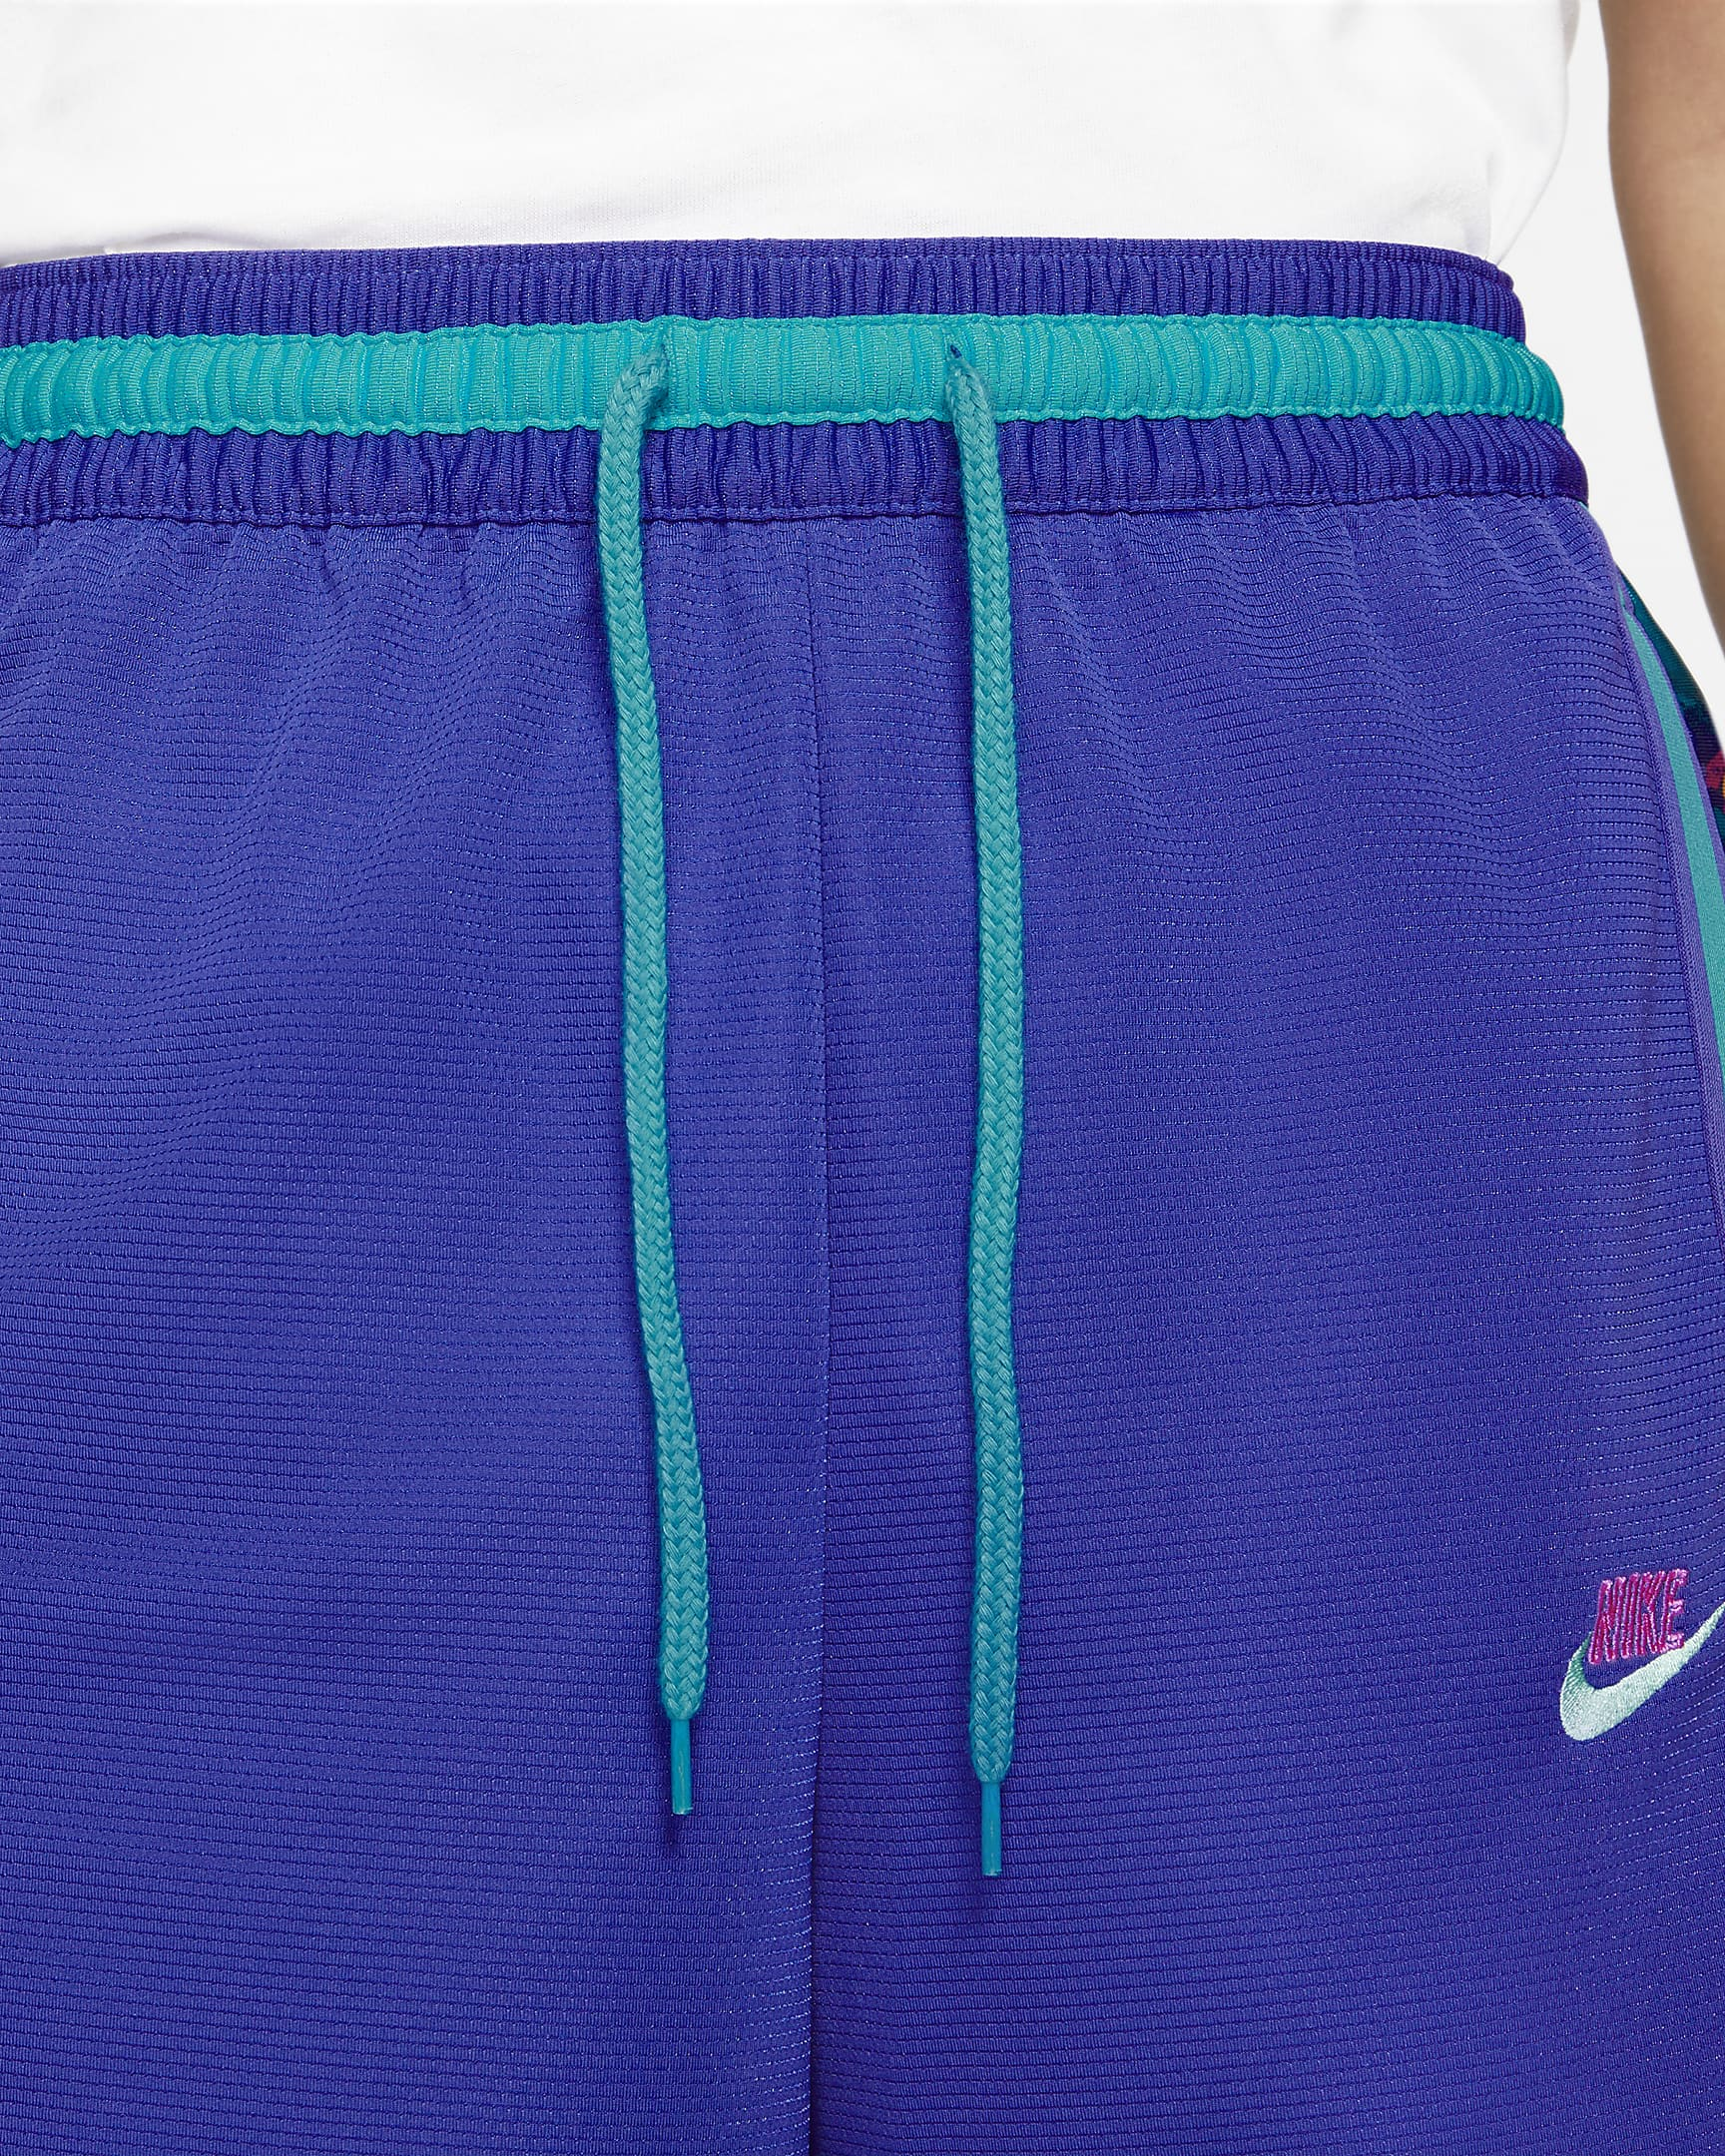 nike-dri-fit-dna-stories-mens-basketball-shorts-gLqWHW-2.png